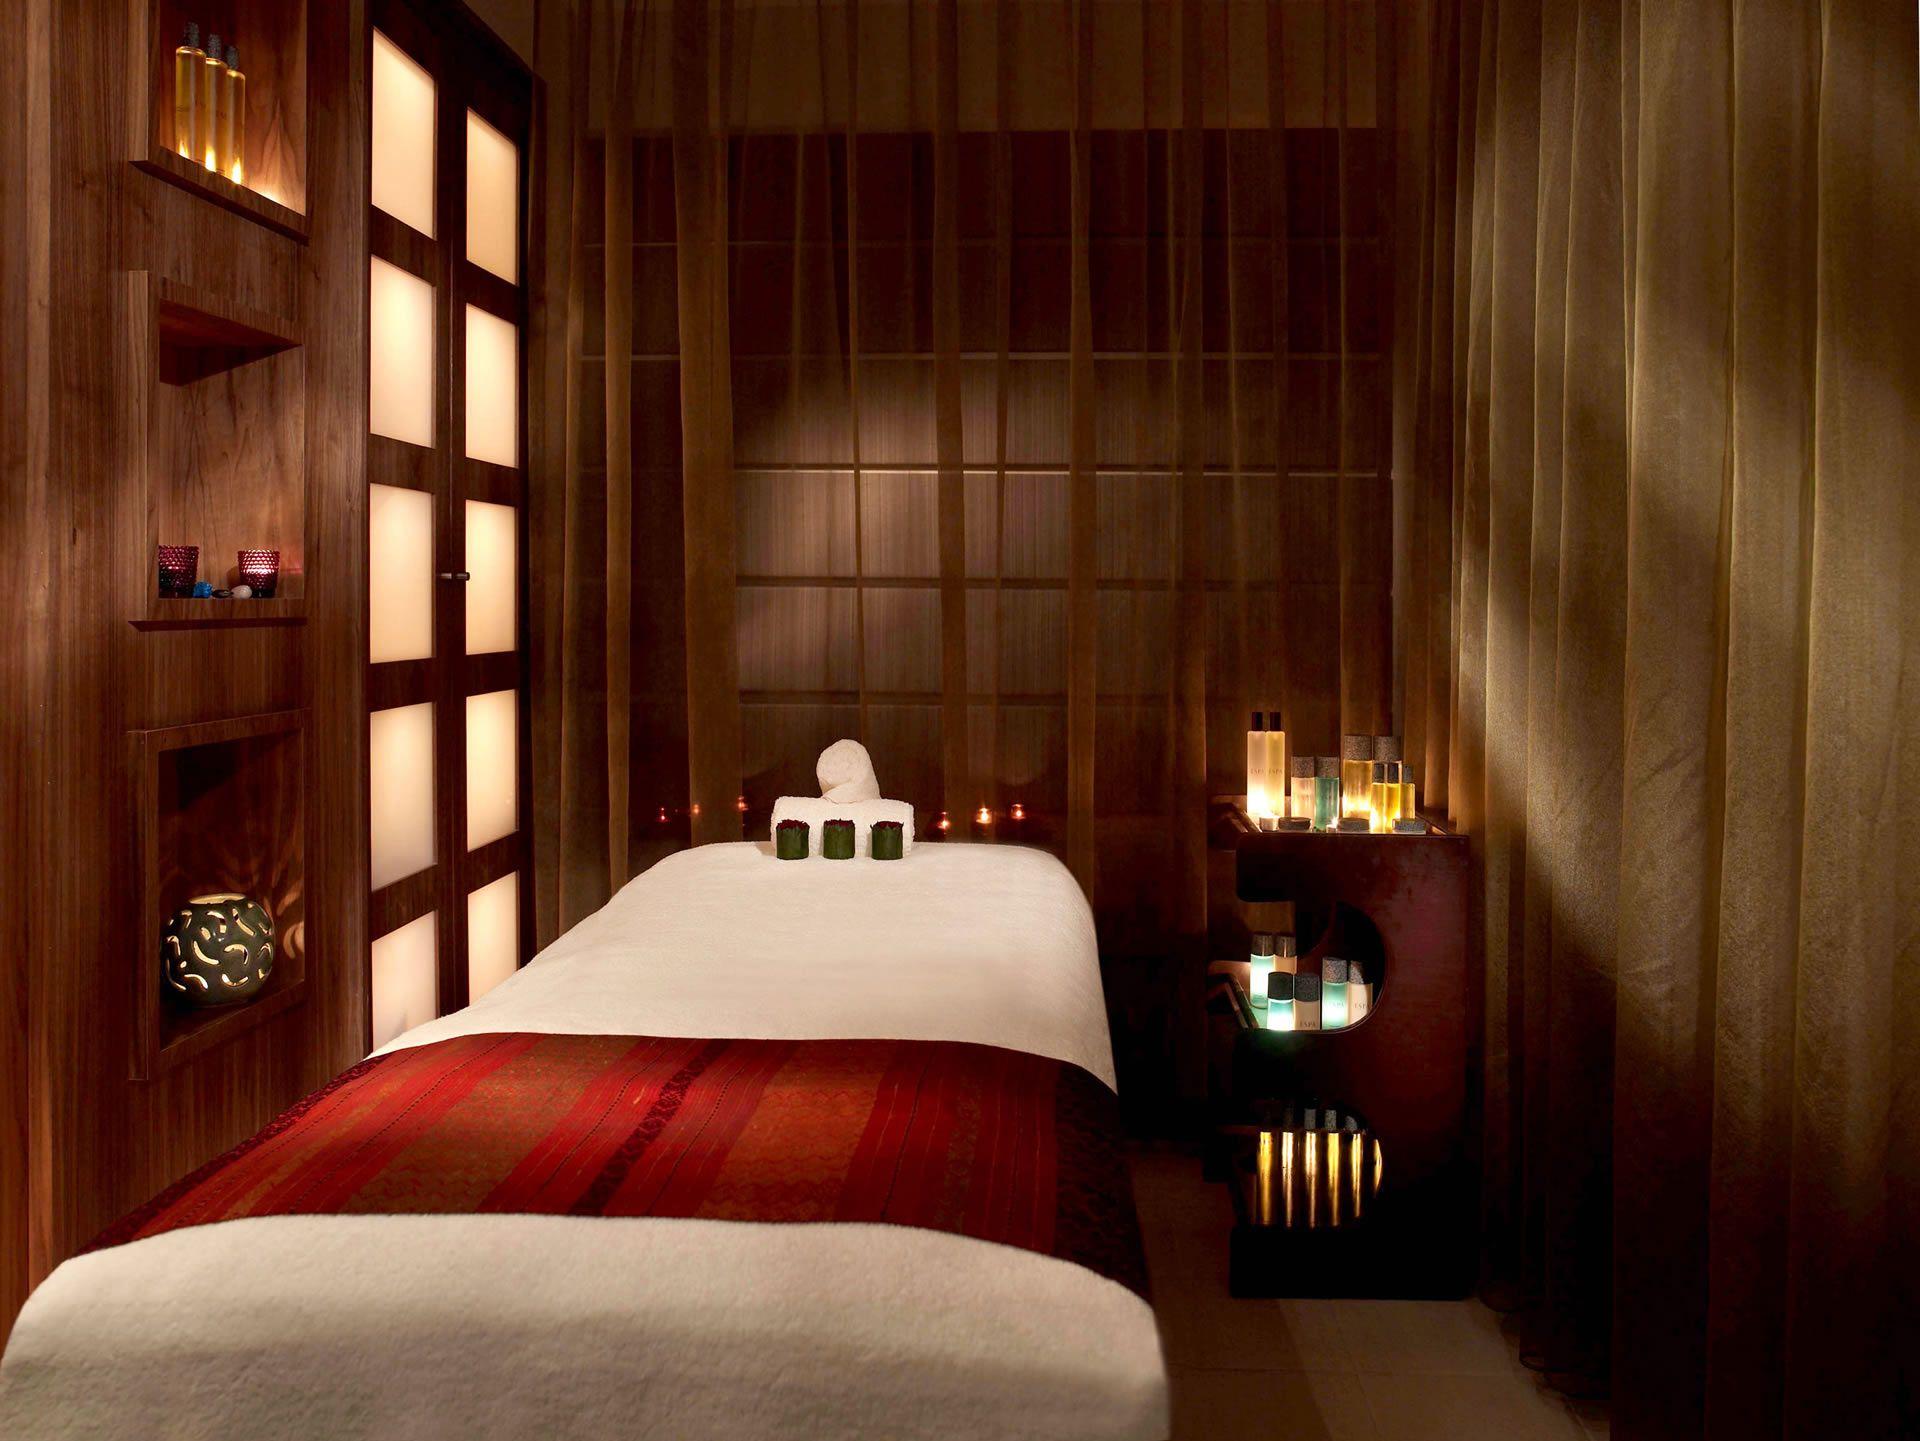 Landmark Spa & Health Club Treatment Room Hotel